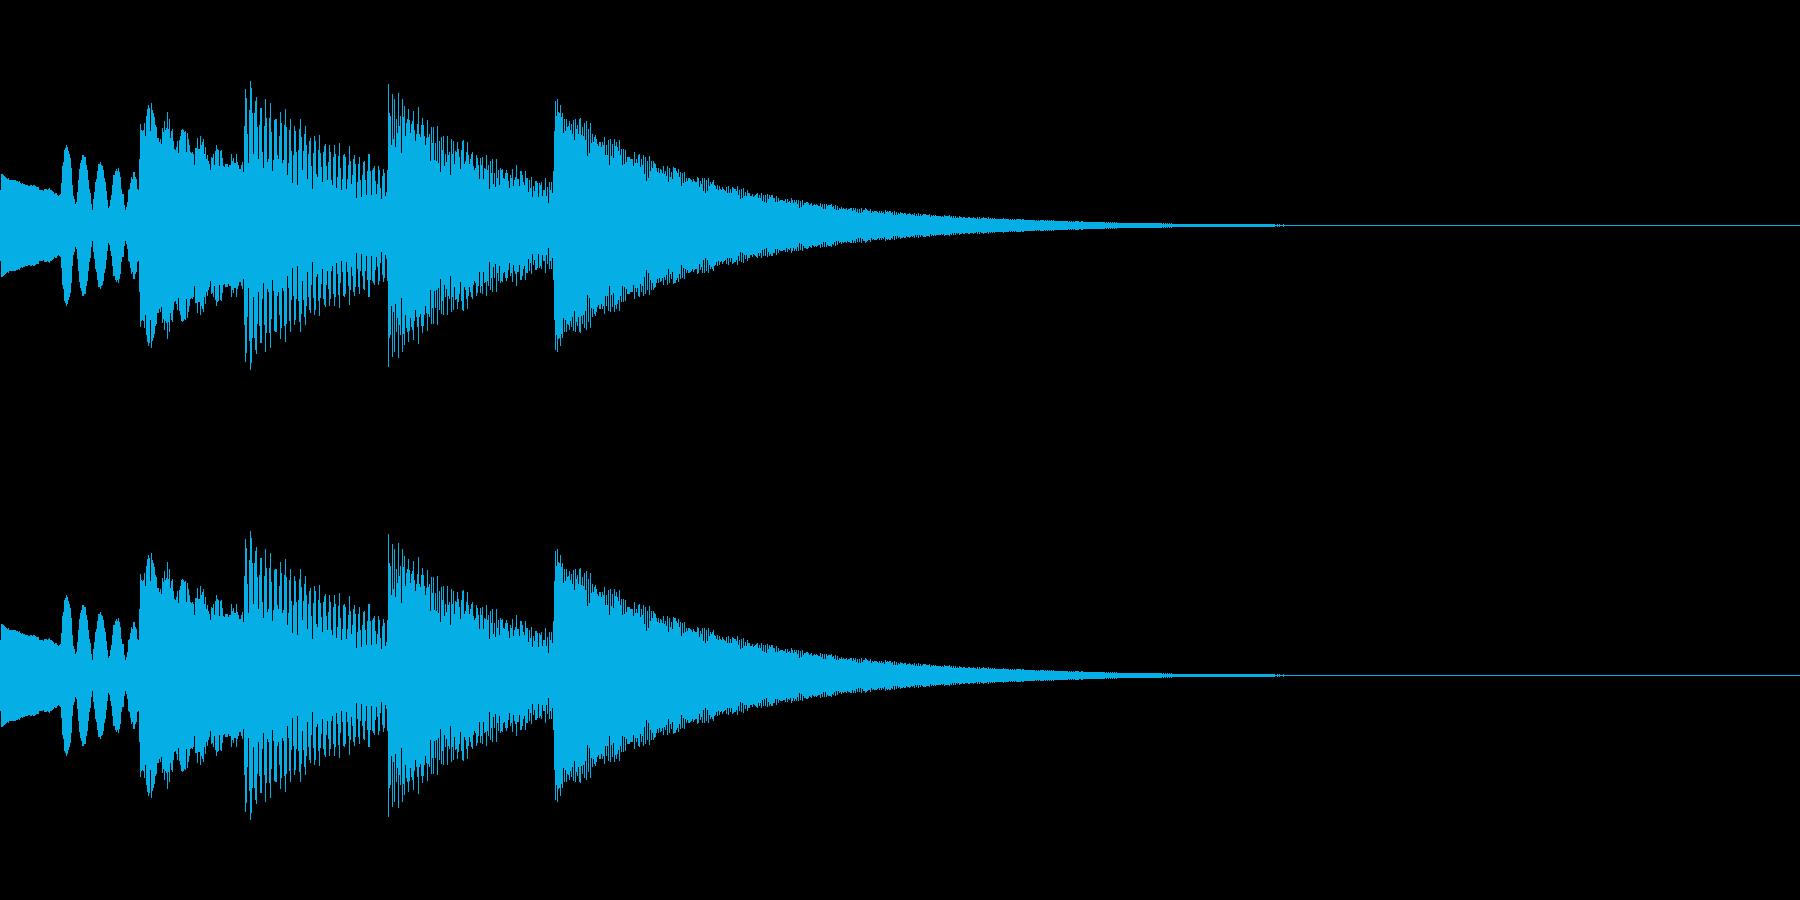 FX・SE/金属/スクロール/流れる音Gの再生済みの波形